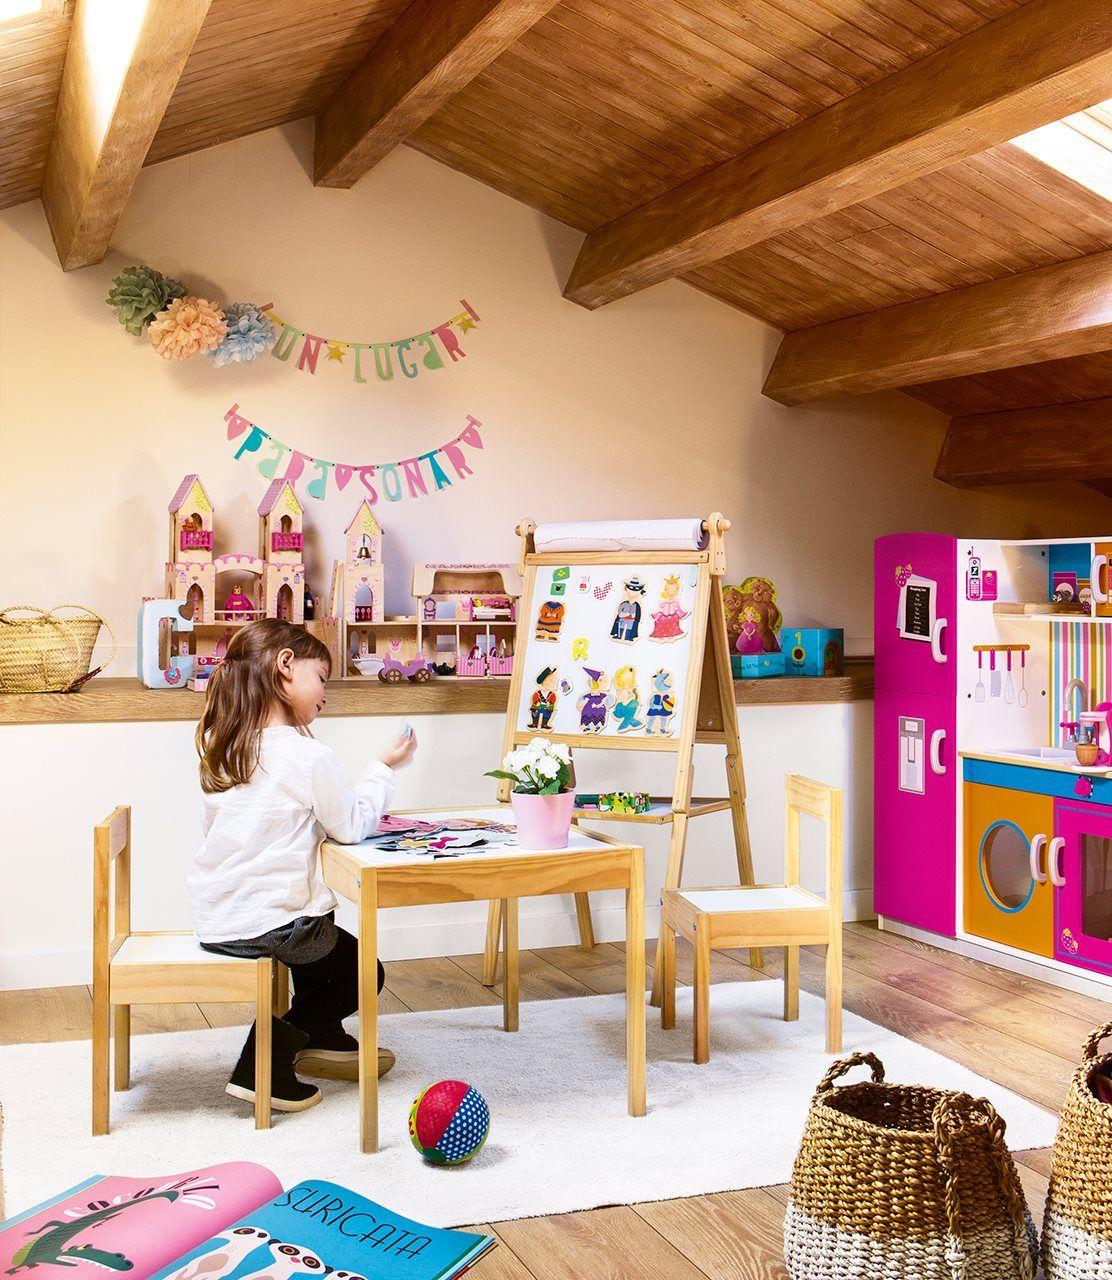 Rinc n de lectura en 2019 dormitorios infantiles for Decoracion habitacion infantil montessori